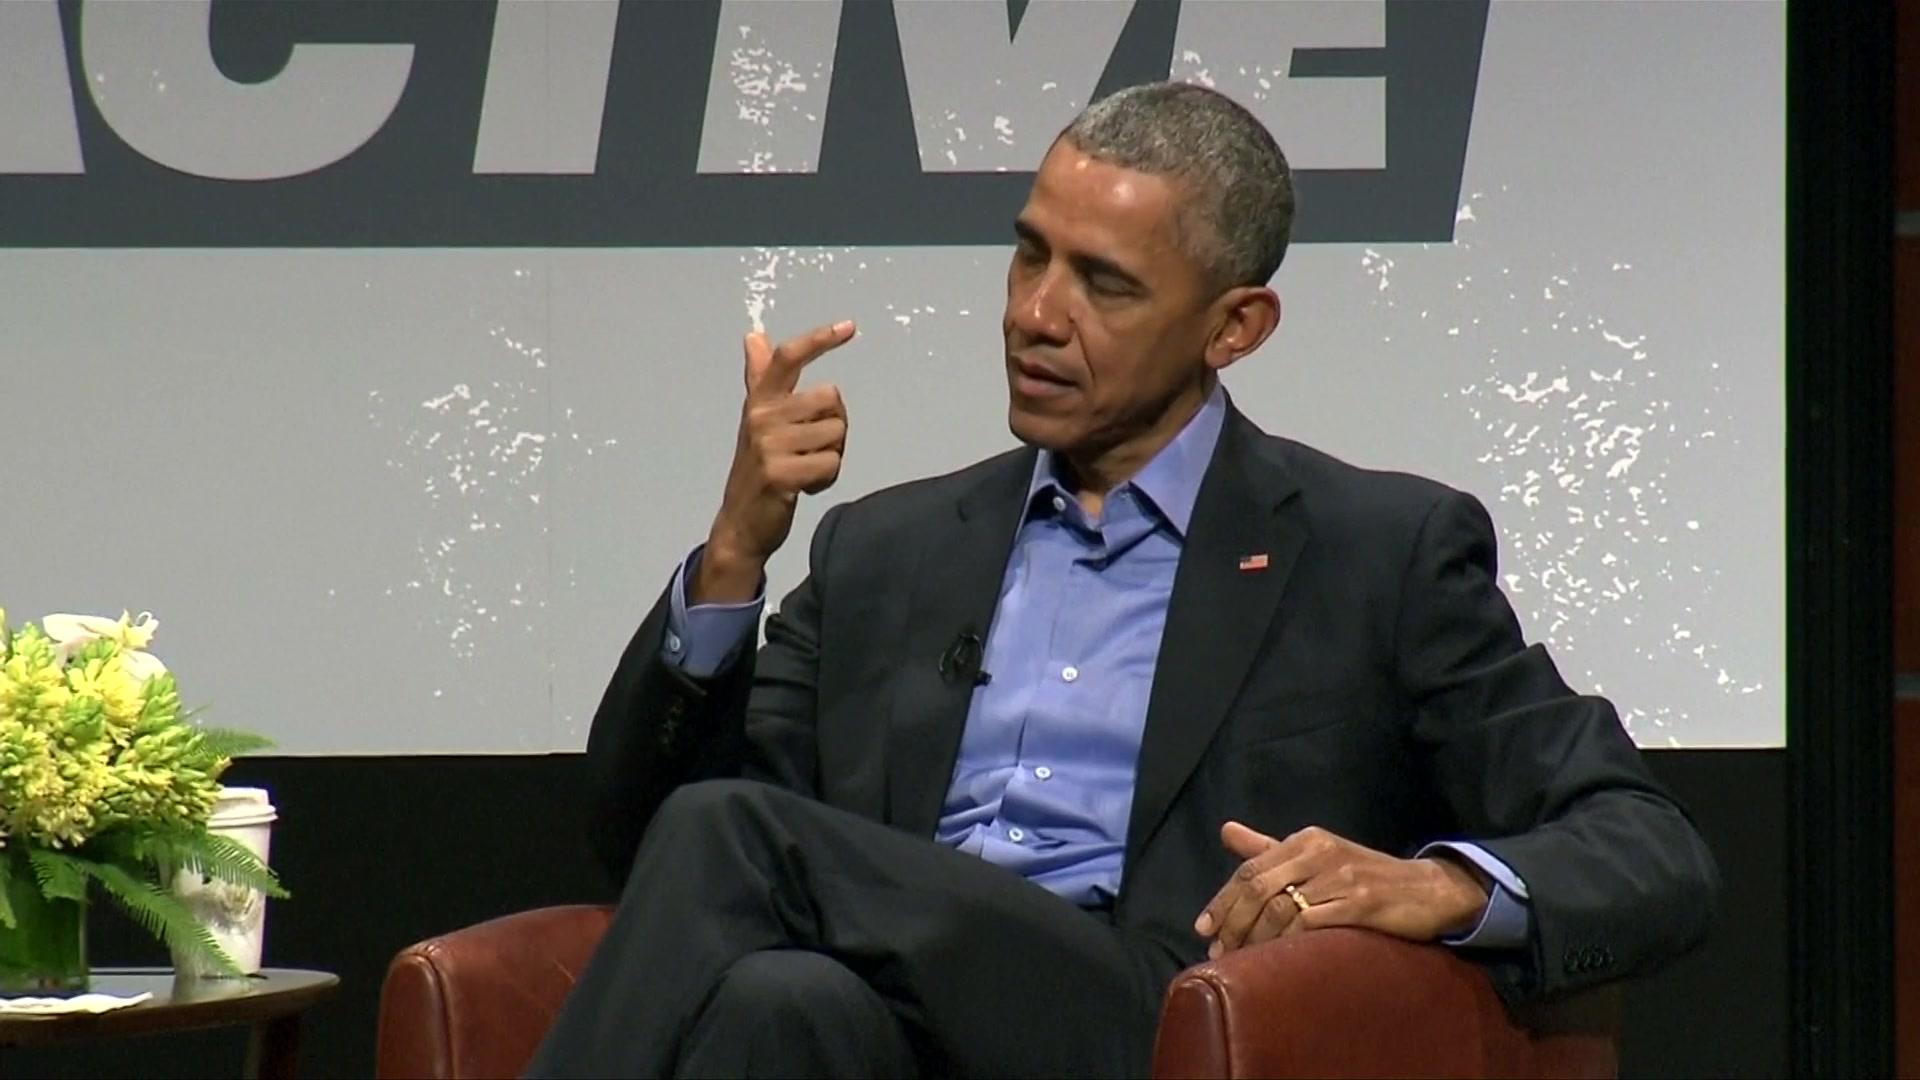 Obama: No Comment on Apple Case